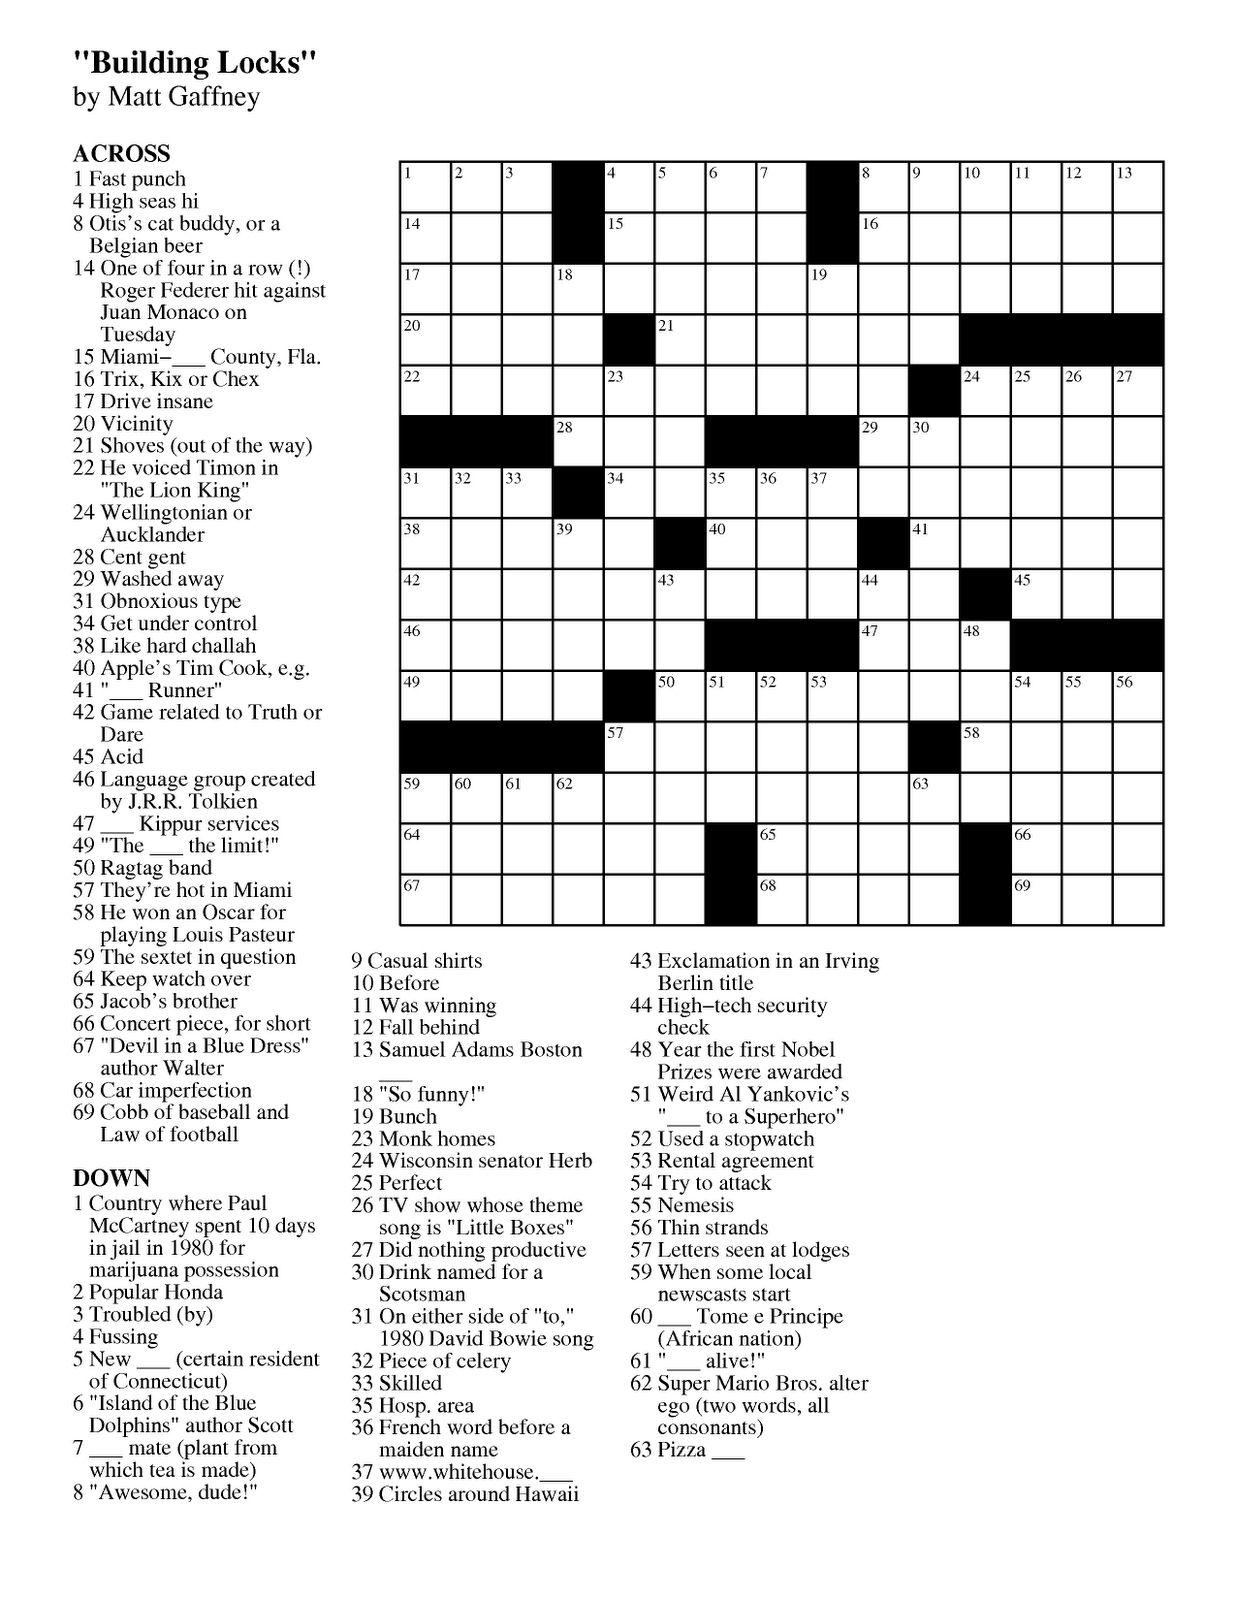 Beatles Crossword Puzzles Printable Printable Crossword Puzzles Crossword Puzzle Maker Crossword Puzzles [ 1600 x 1236 Pixel ]